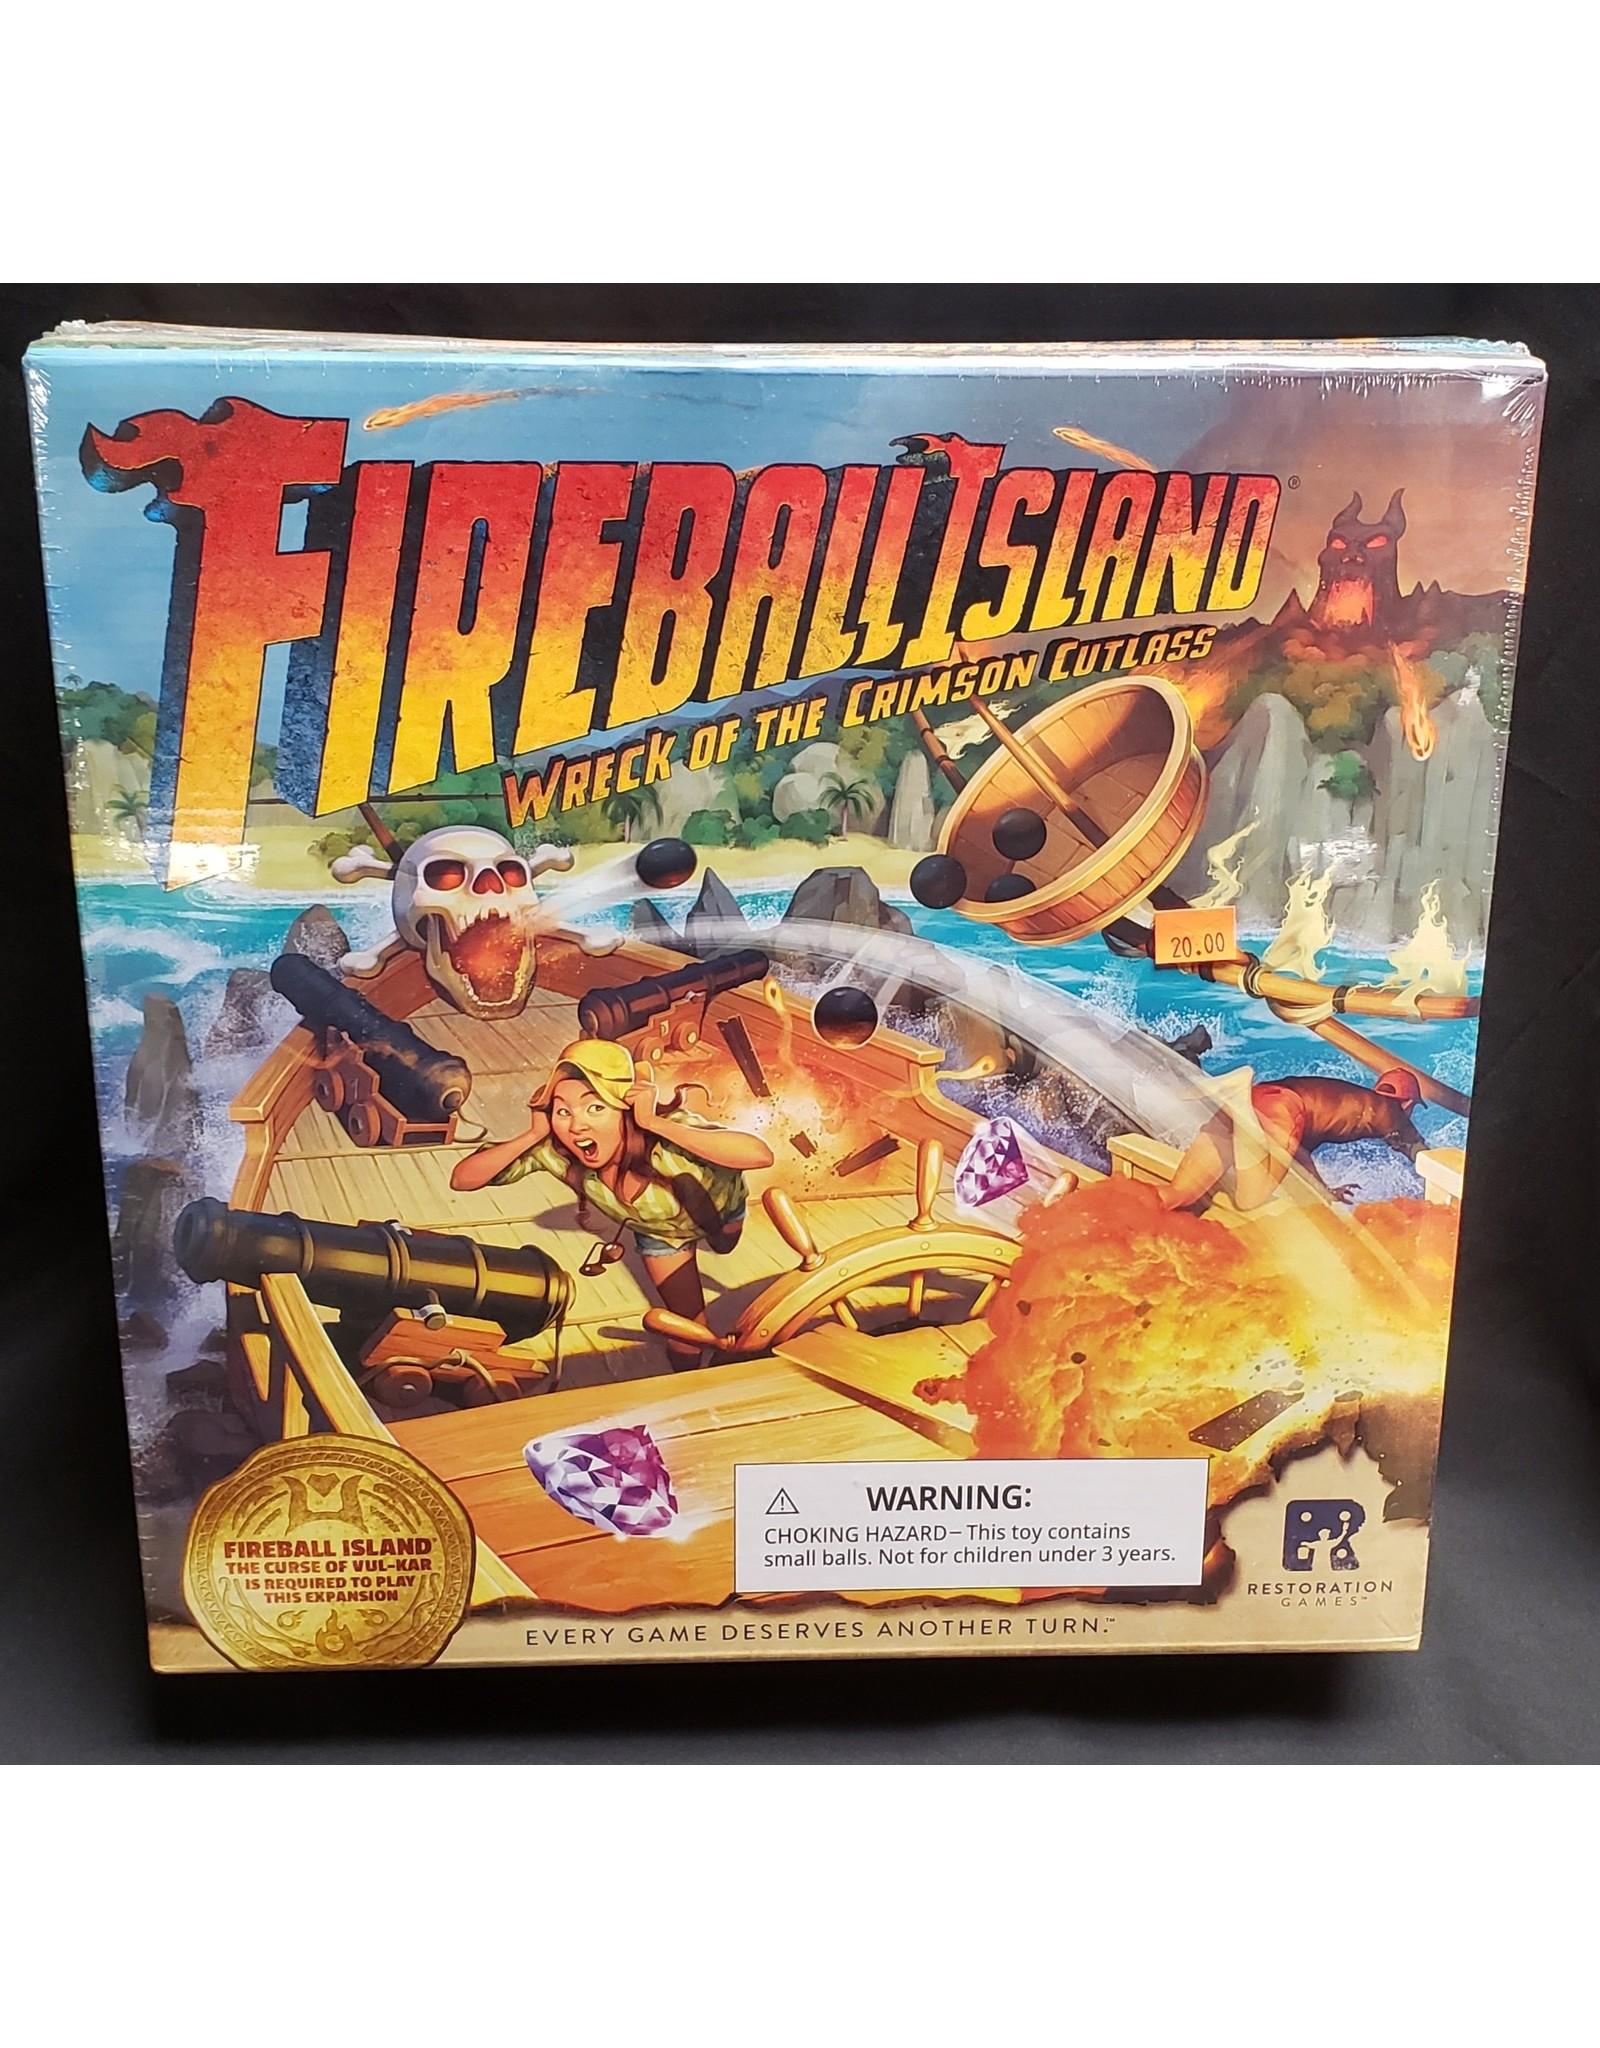 Fireball Island: Wreck of the Crimson Cutlas Expansion (Ding & Dent)